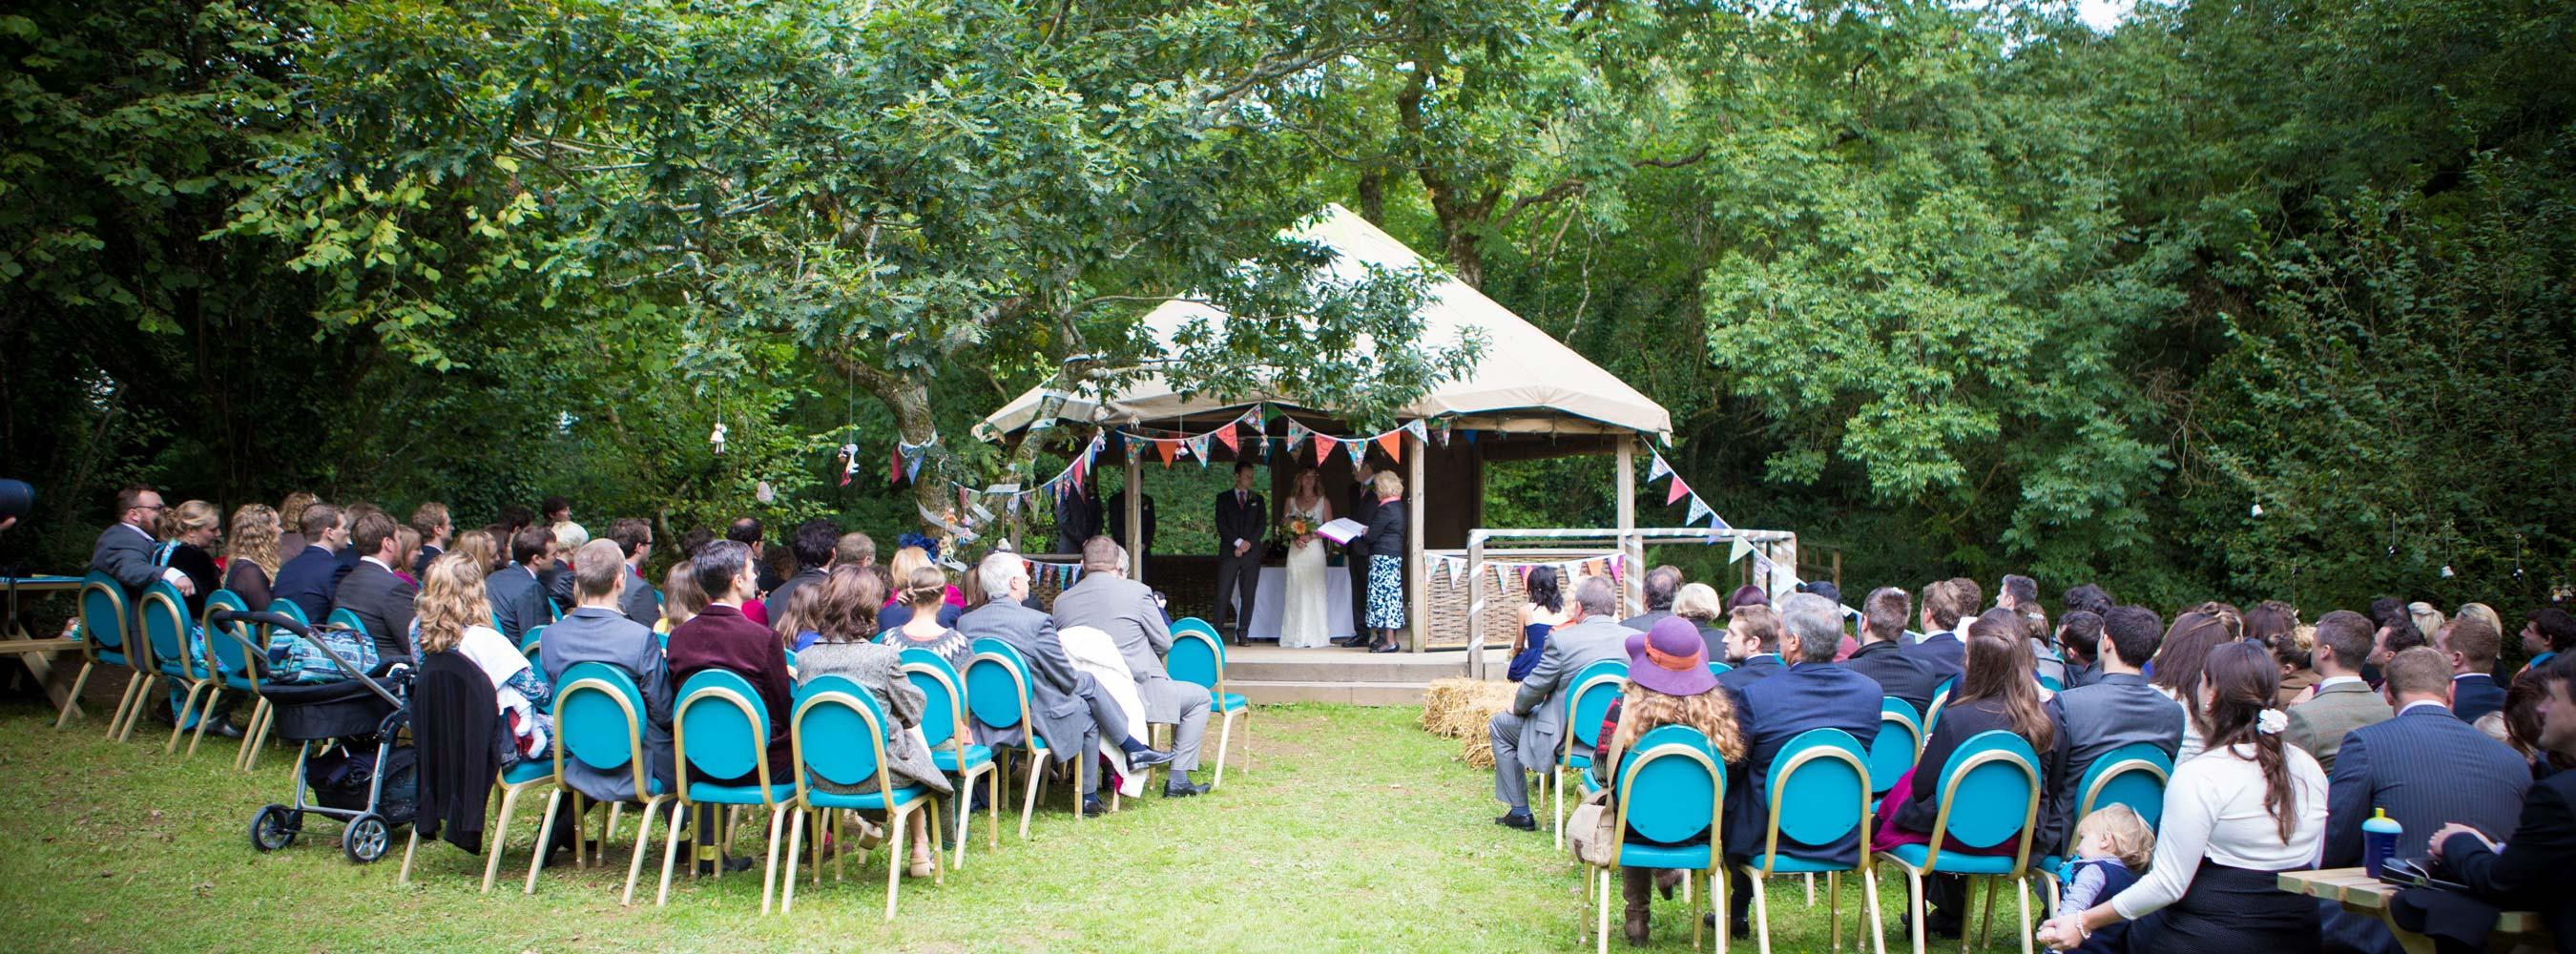 Wedding Pavilion Outside Legal Ceremony